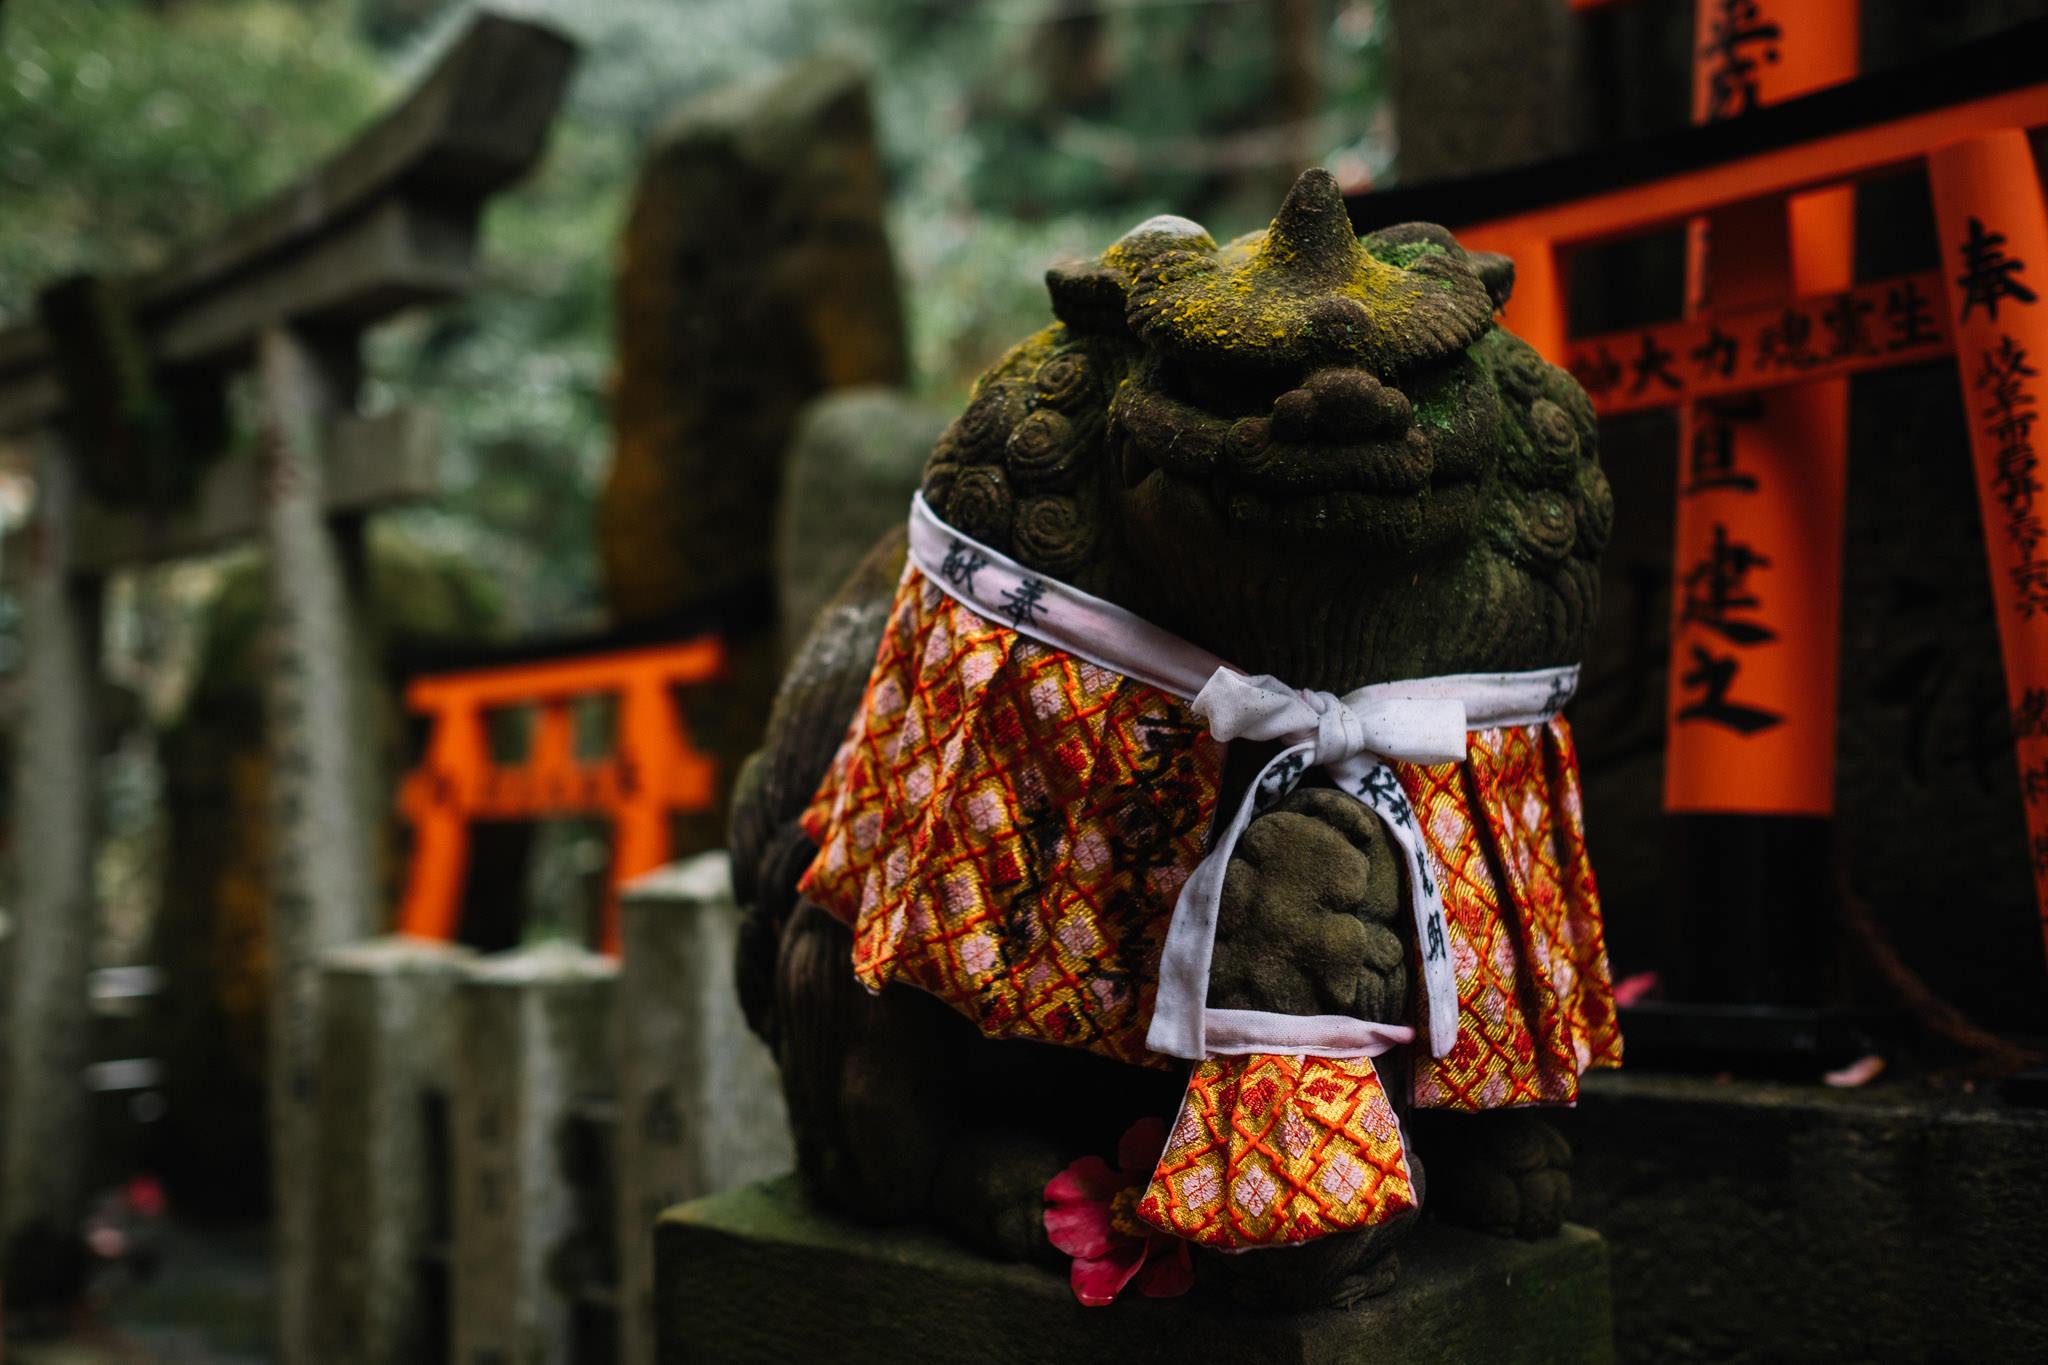 chris_eberhardt_japan_travel_reise_nippon-50.jpg